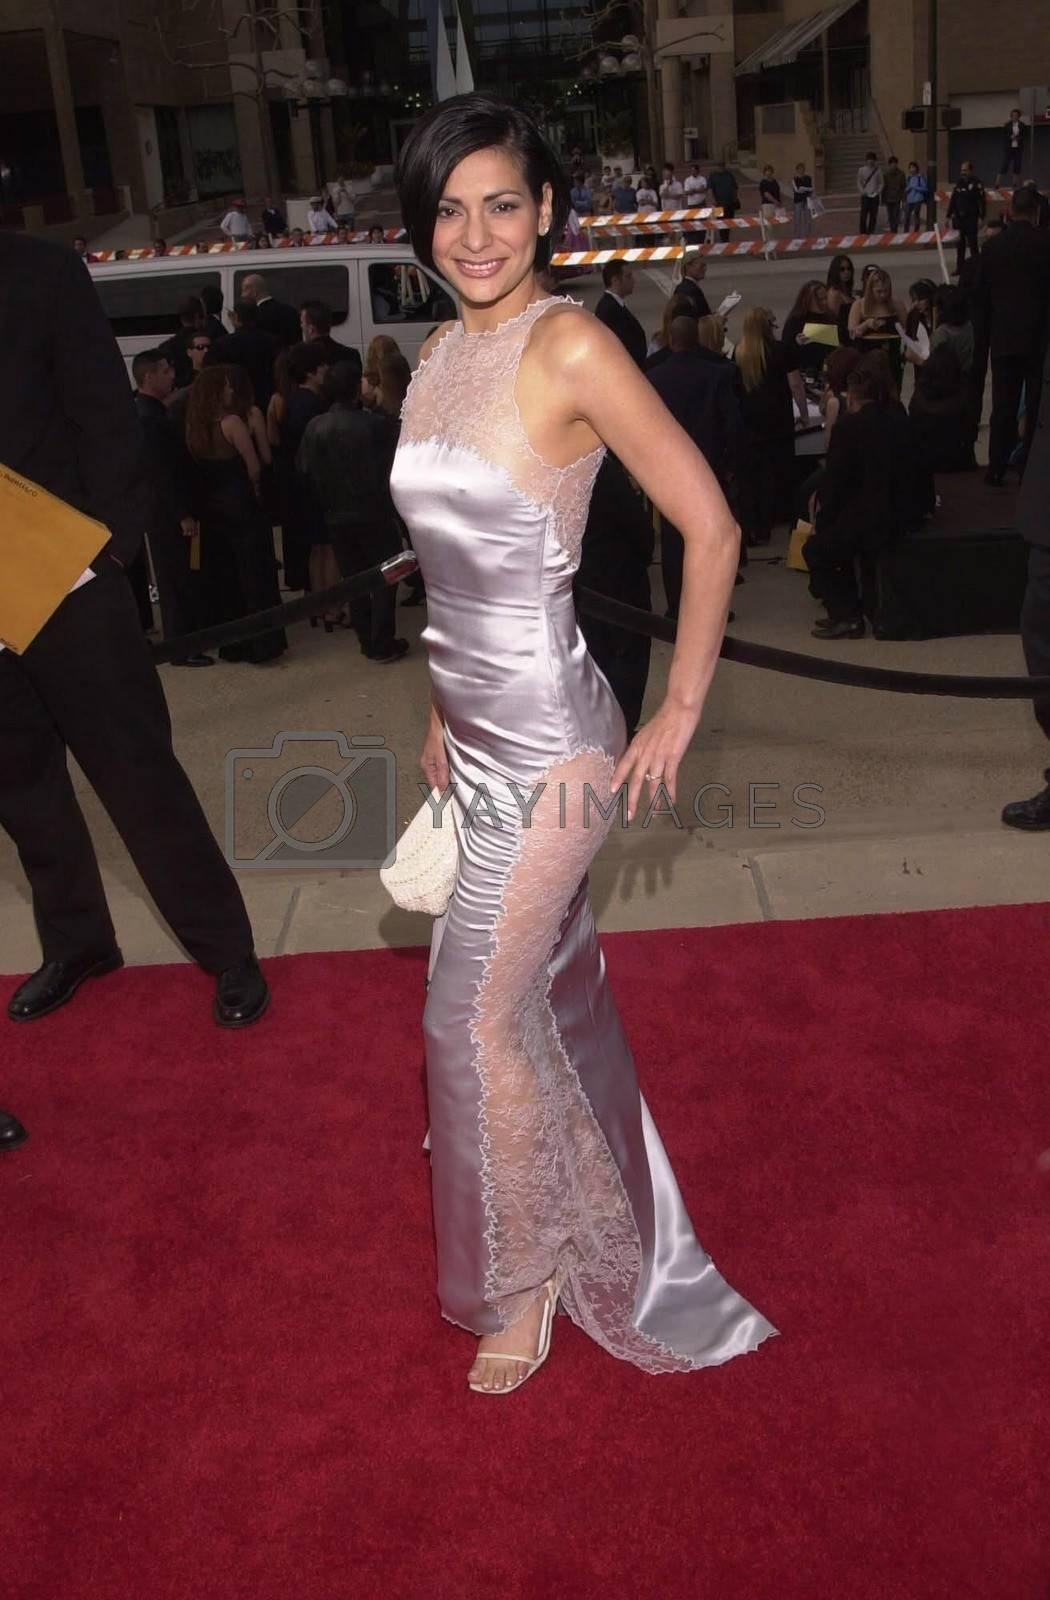 Constance Marie at the 2000 Alma Awards, in Pasadena, 04-16-00